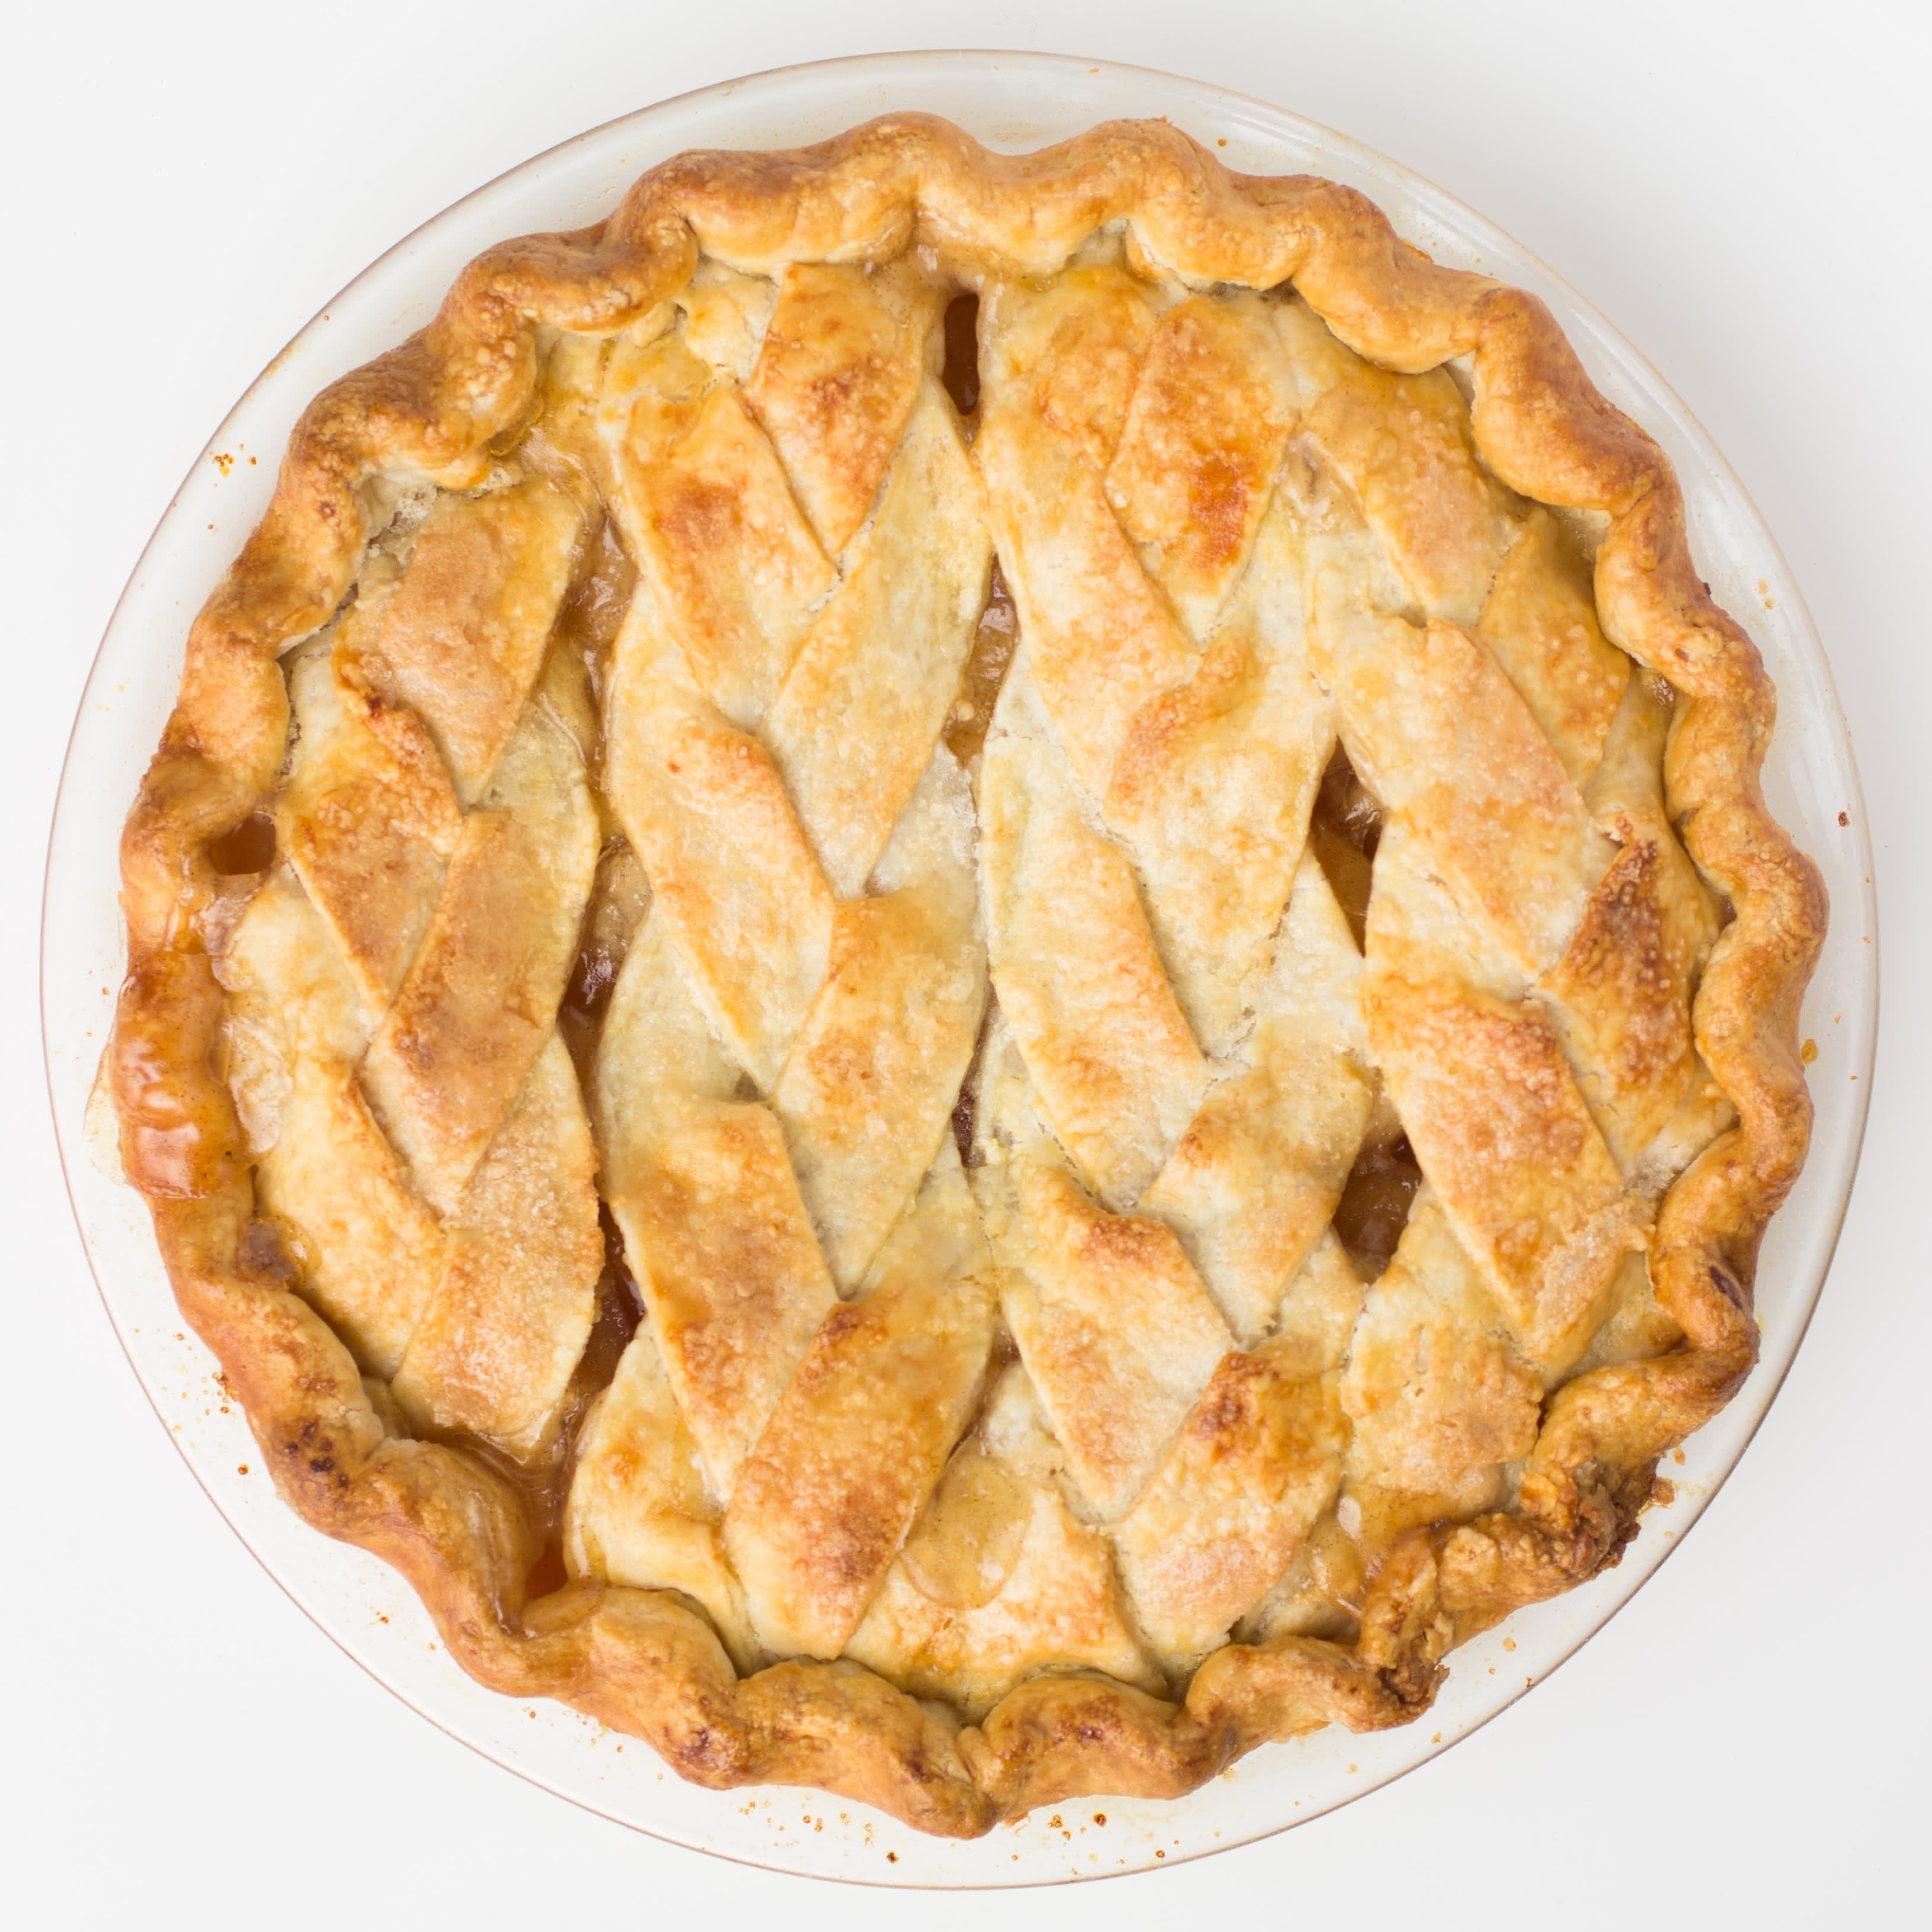 Braided Pie Crust - How to Decorate Pie Crust